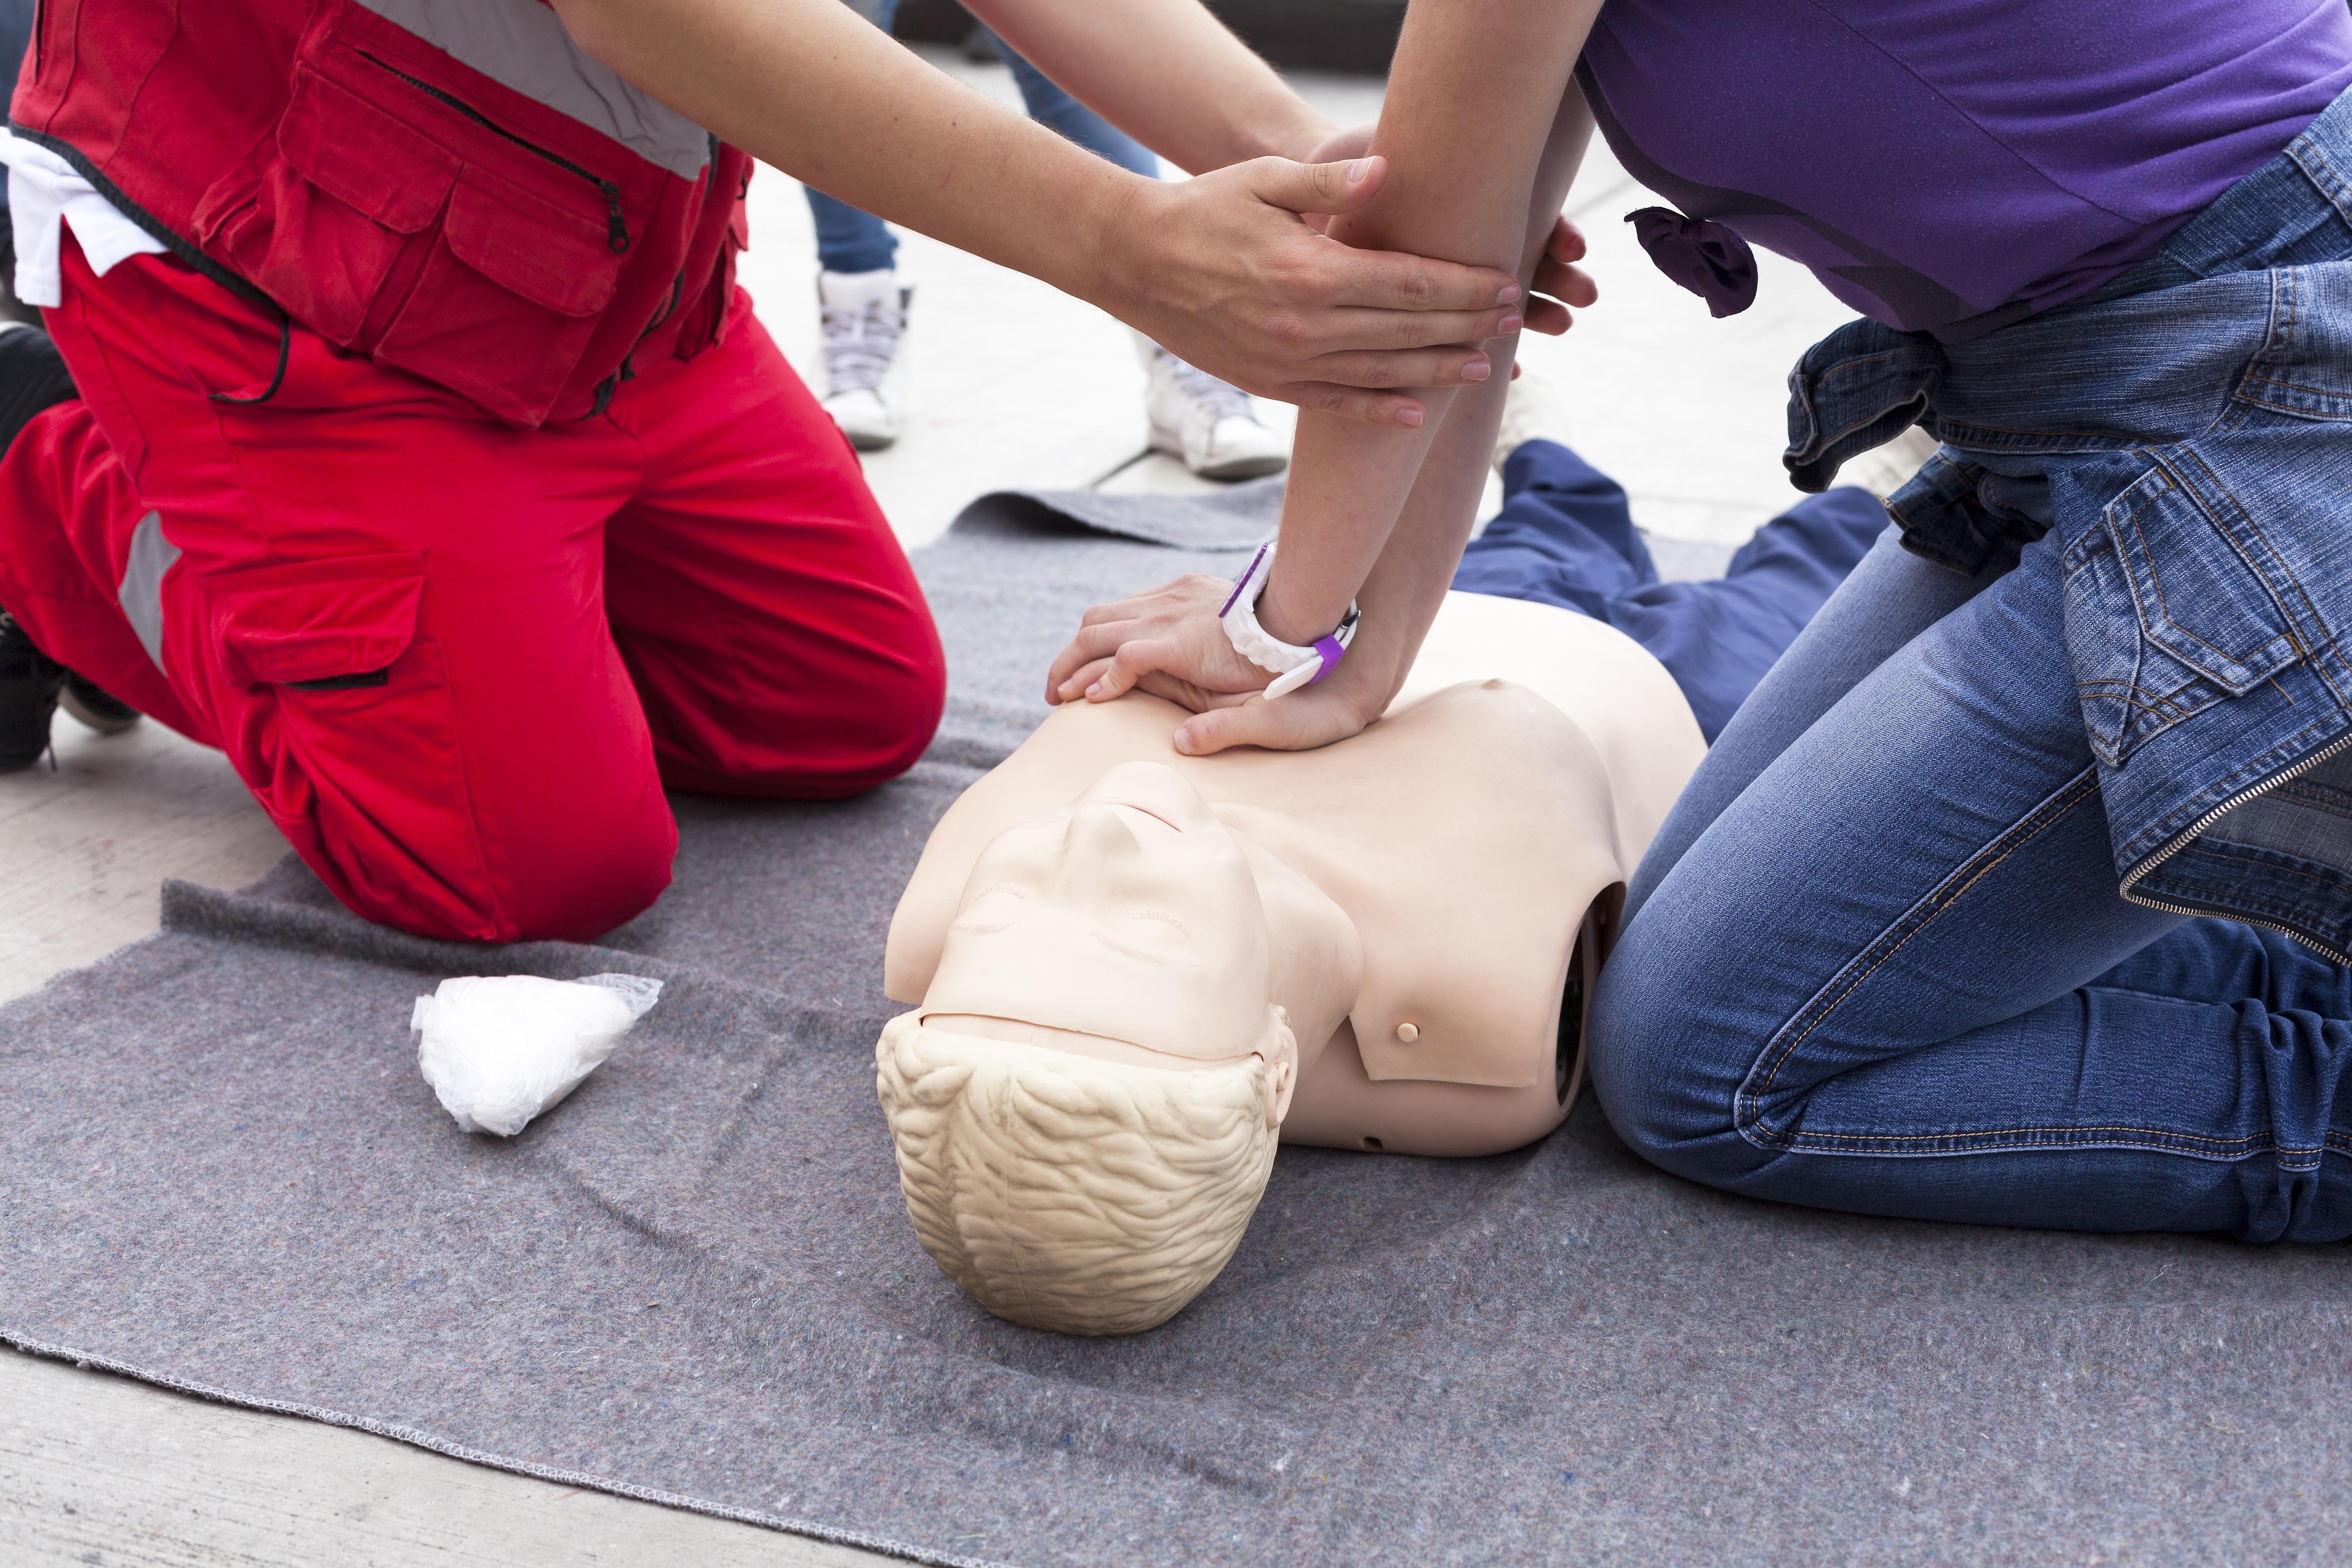 Erste Hilfe Kurs - Im Notfall zählt jede Sekunde